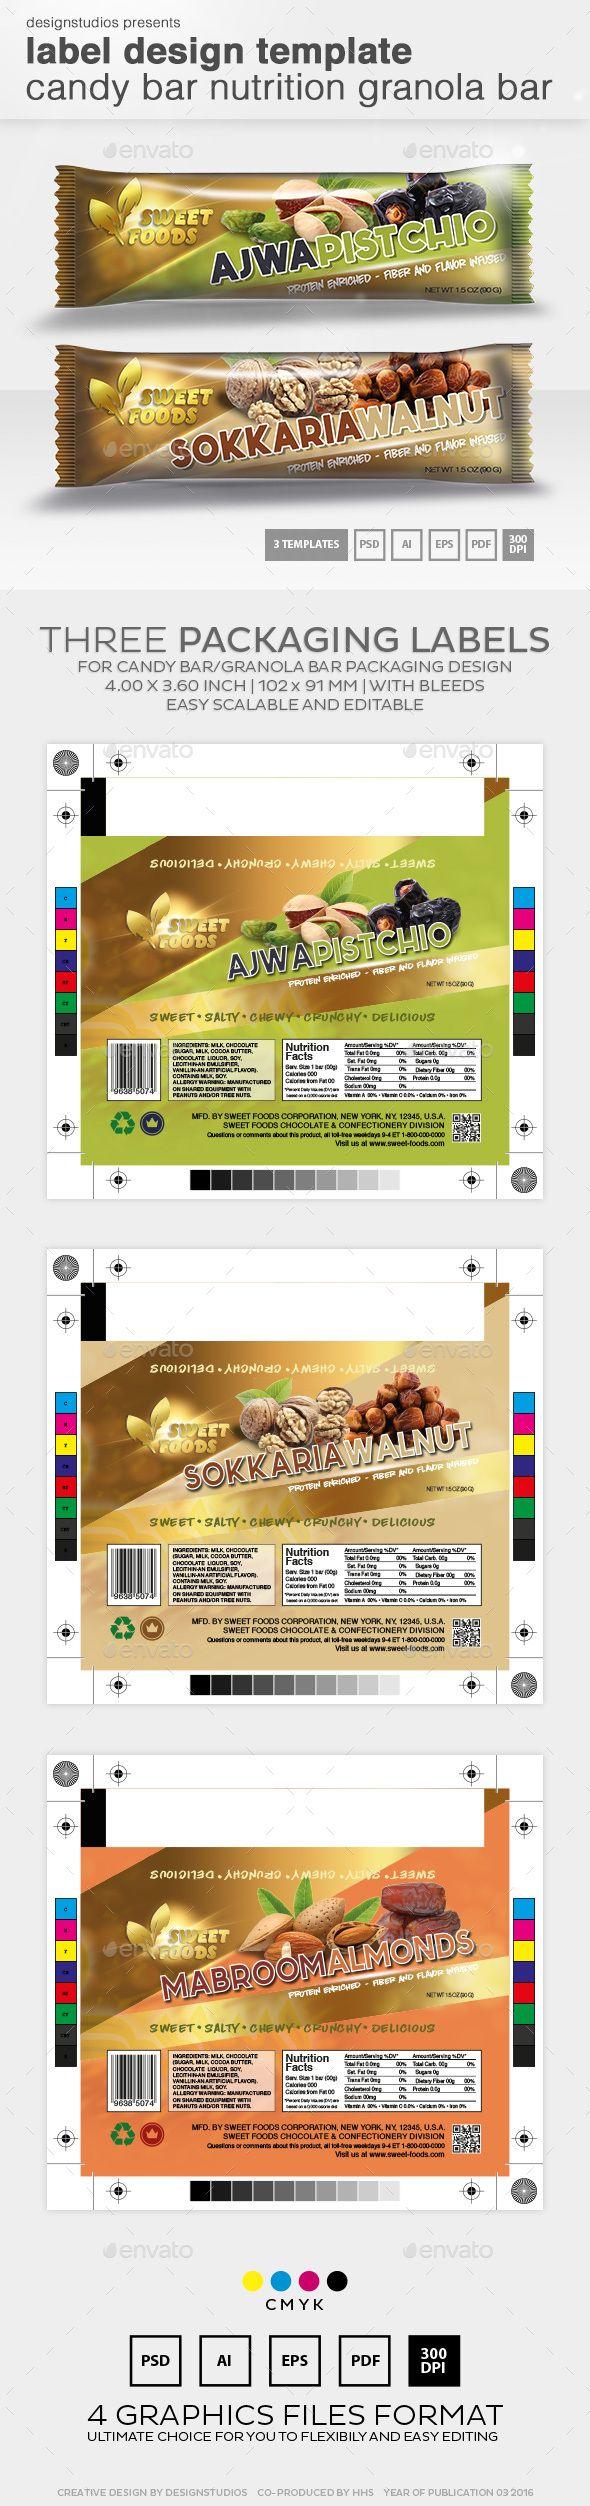 Label Design Template Candy Bar Nutrition Granola Bar